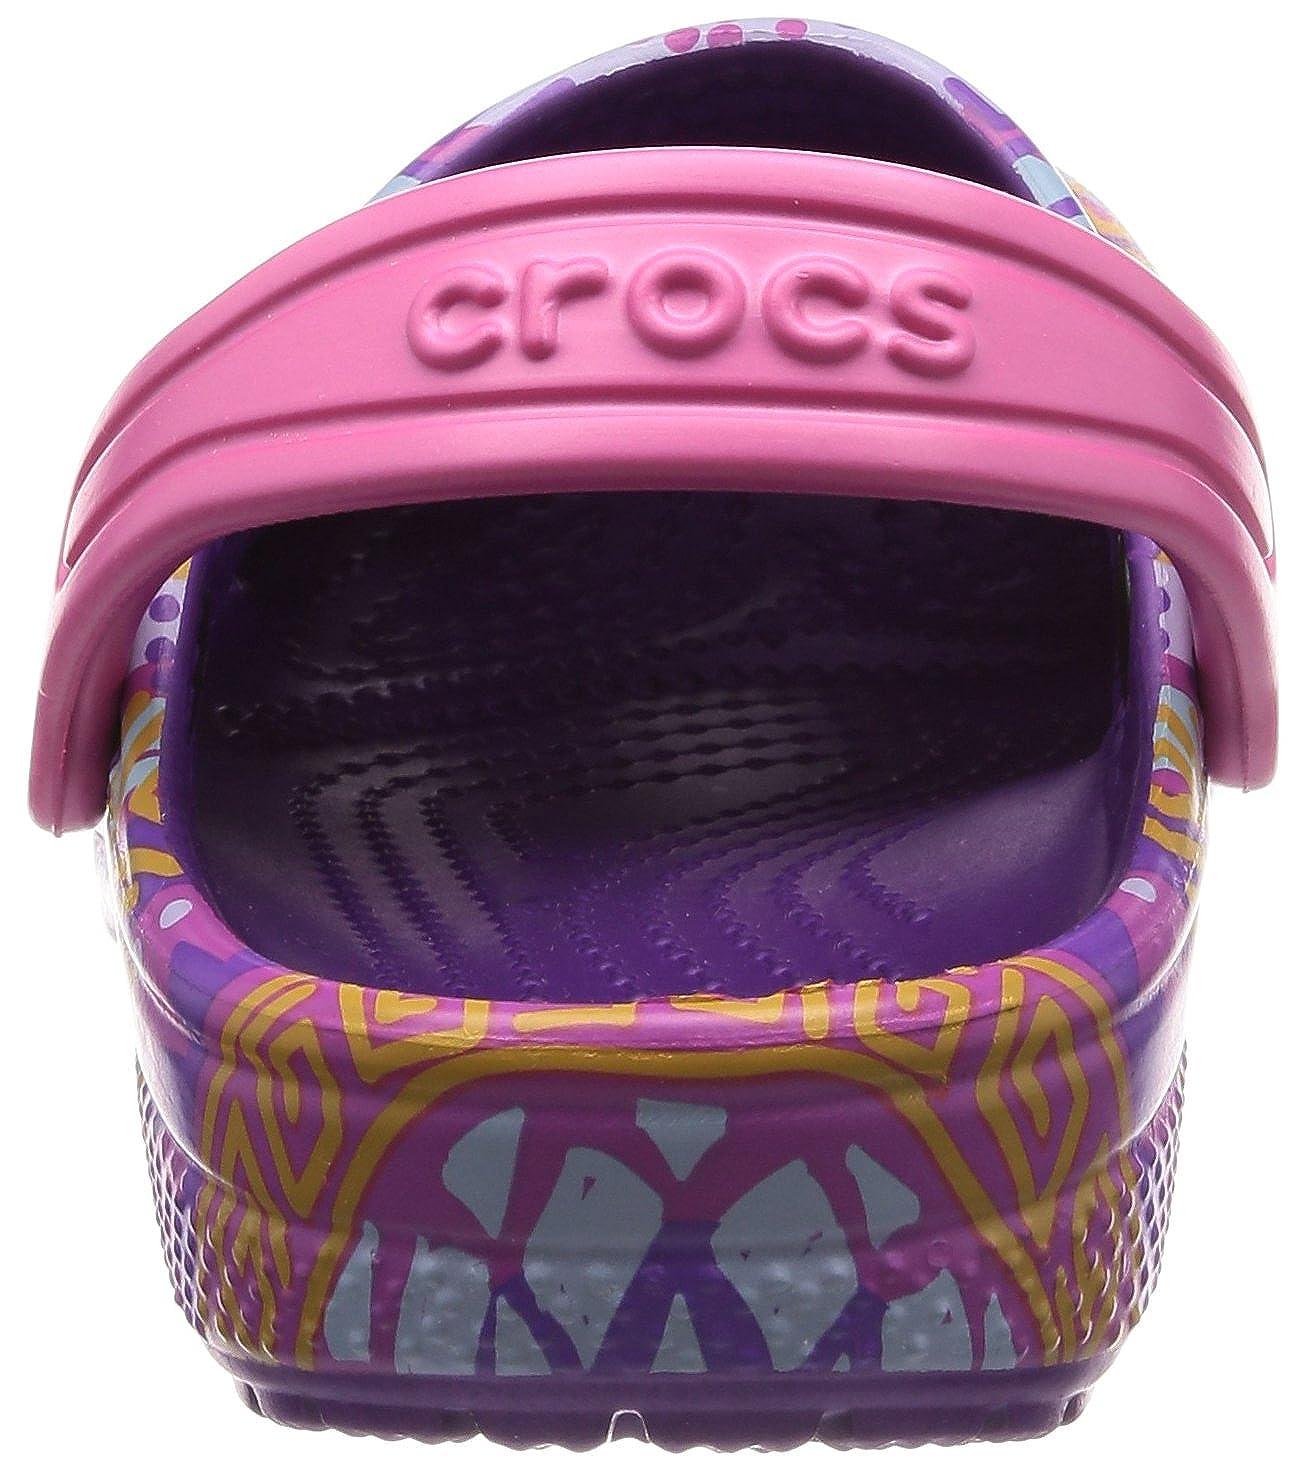 Bambini Crocs Classic Graphic Clog Kids Zoccoli Unisex